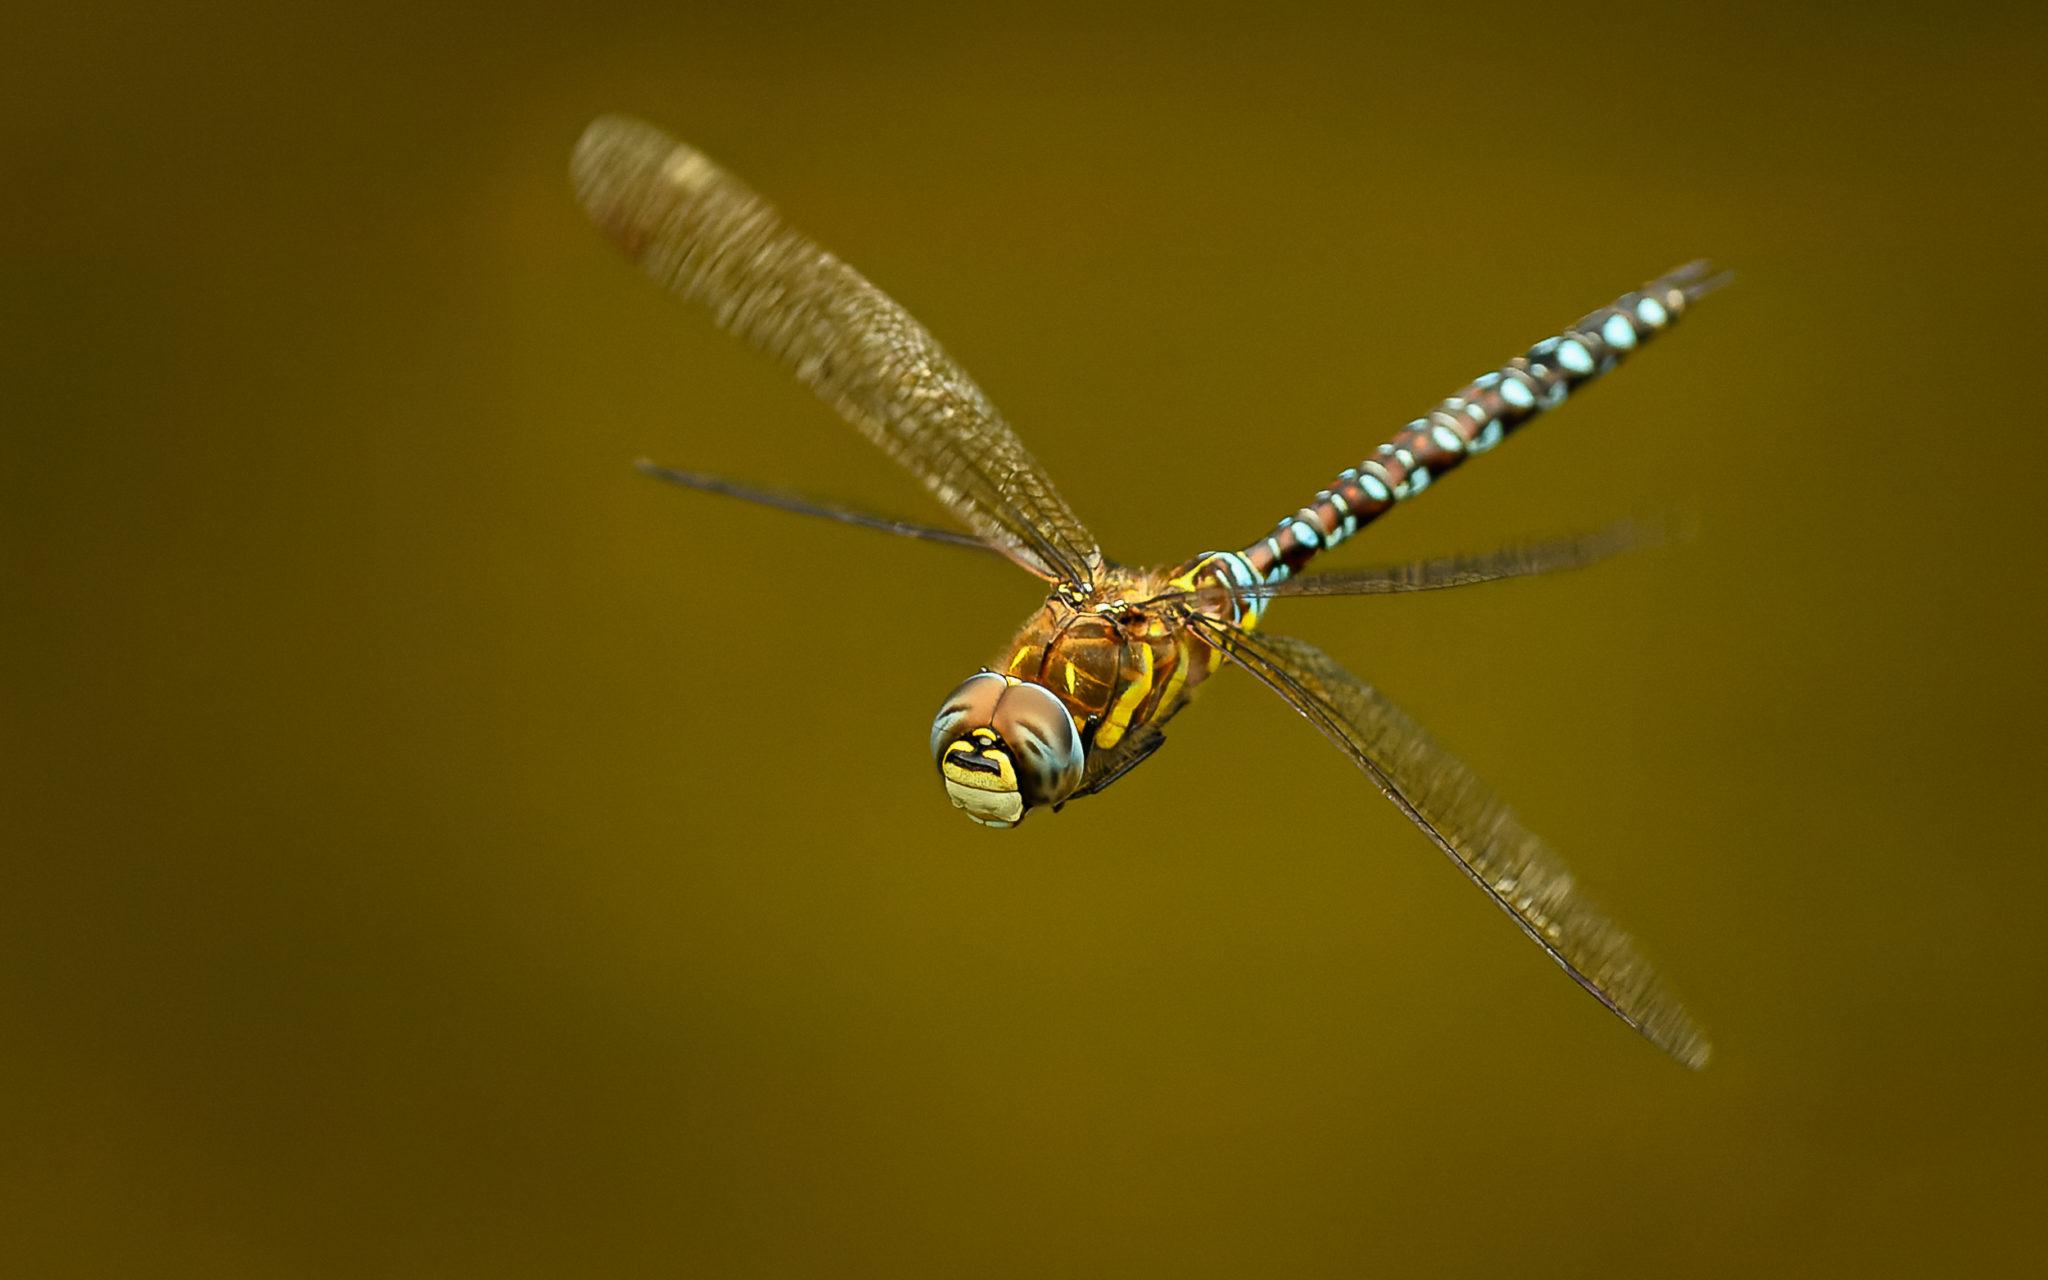 Herbst-Mosaikjungfer (Aeshna mixta) im Flug, Naturfotografie Sylvia & Olaf Rentzsch